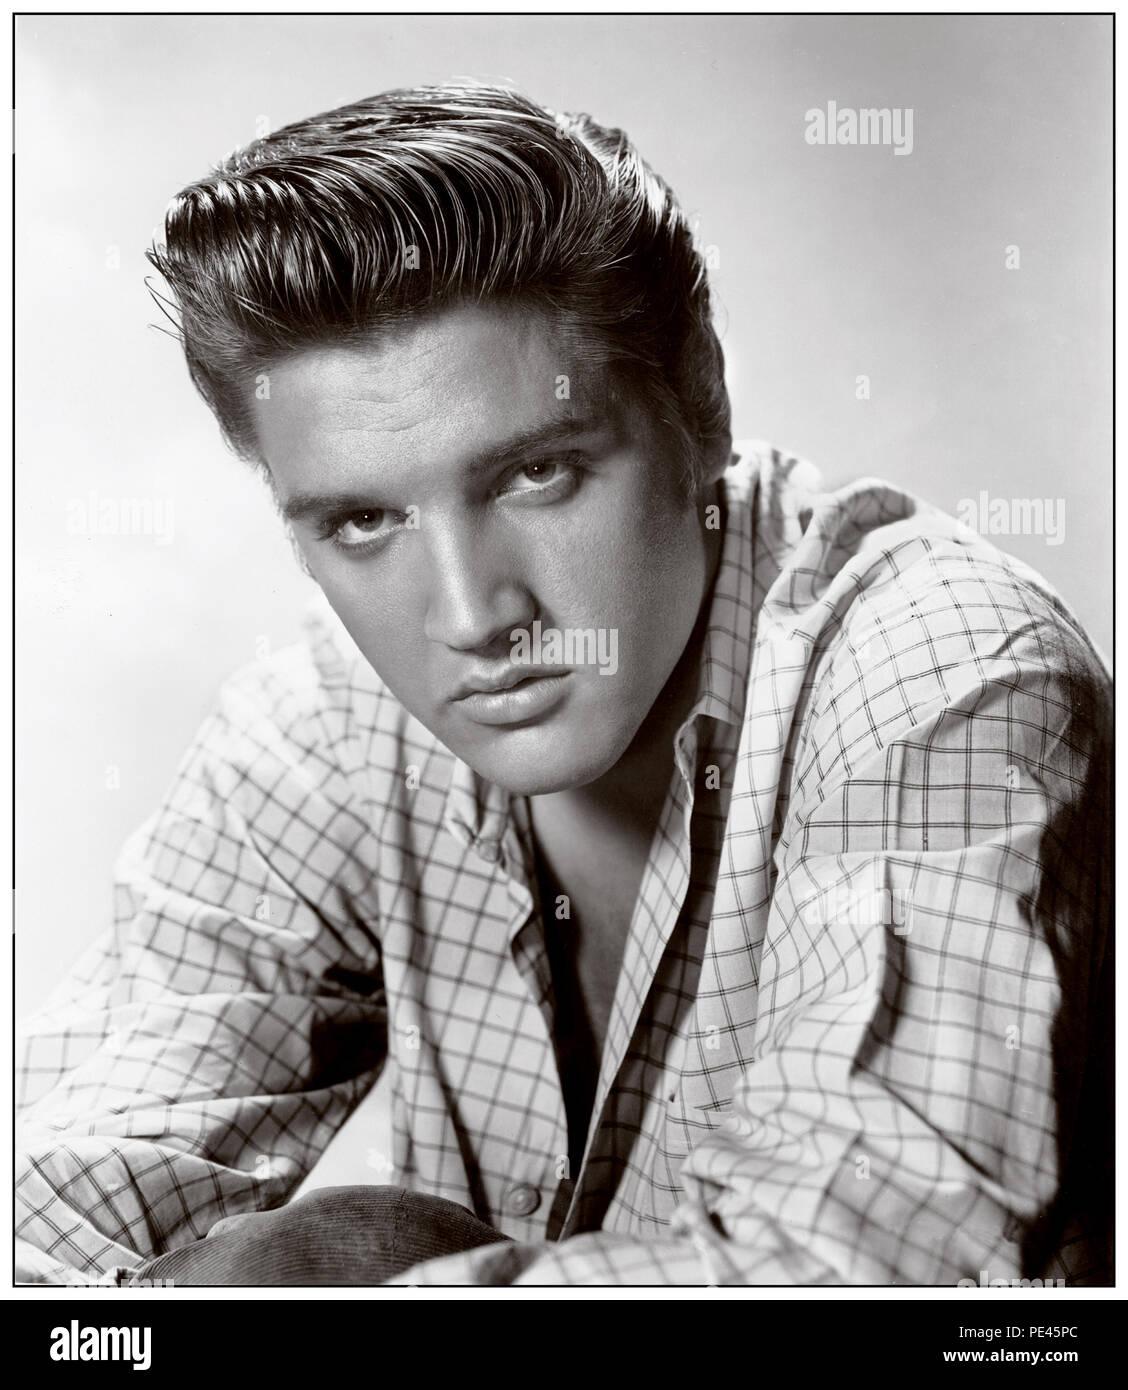 ELVIS PRESLEY '50's Vintage 1950's Hollywood studio press portrait of a brooding Elvis Presley - Stock Image